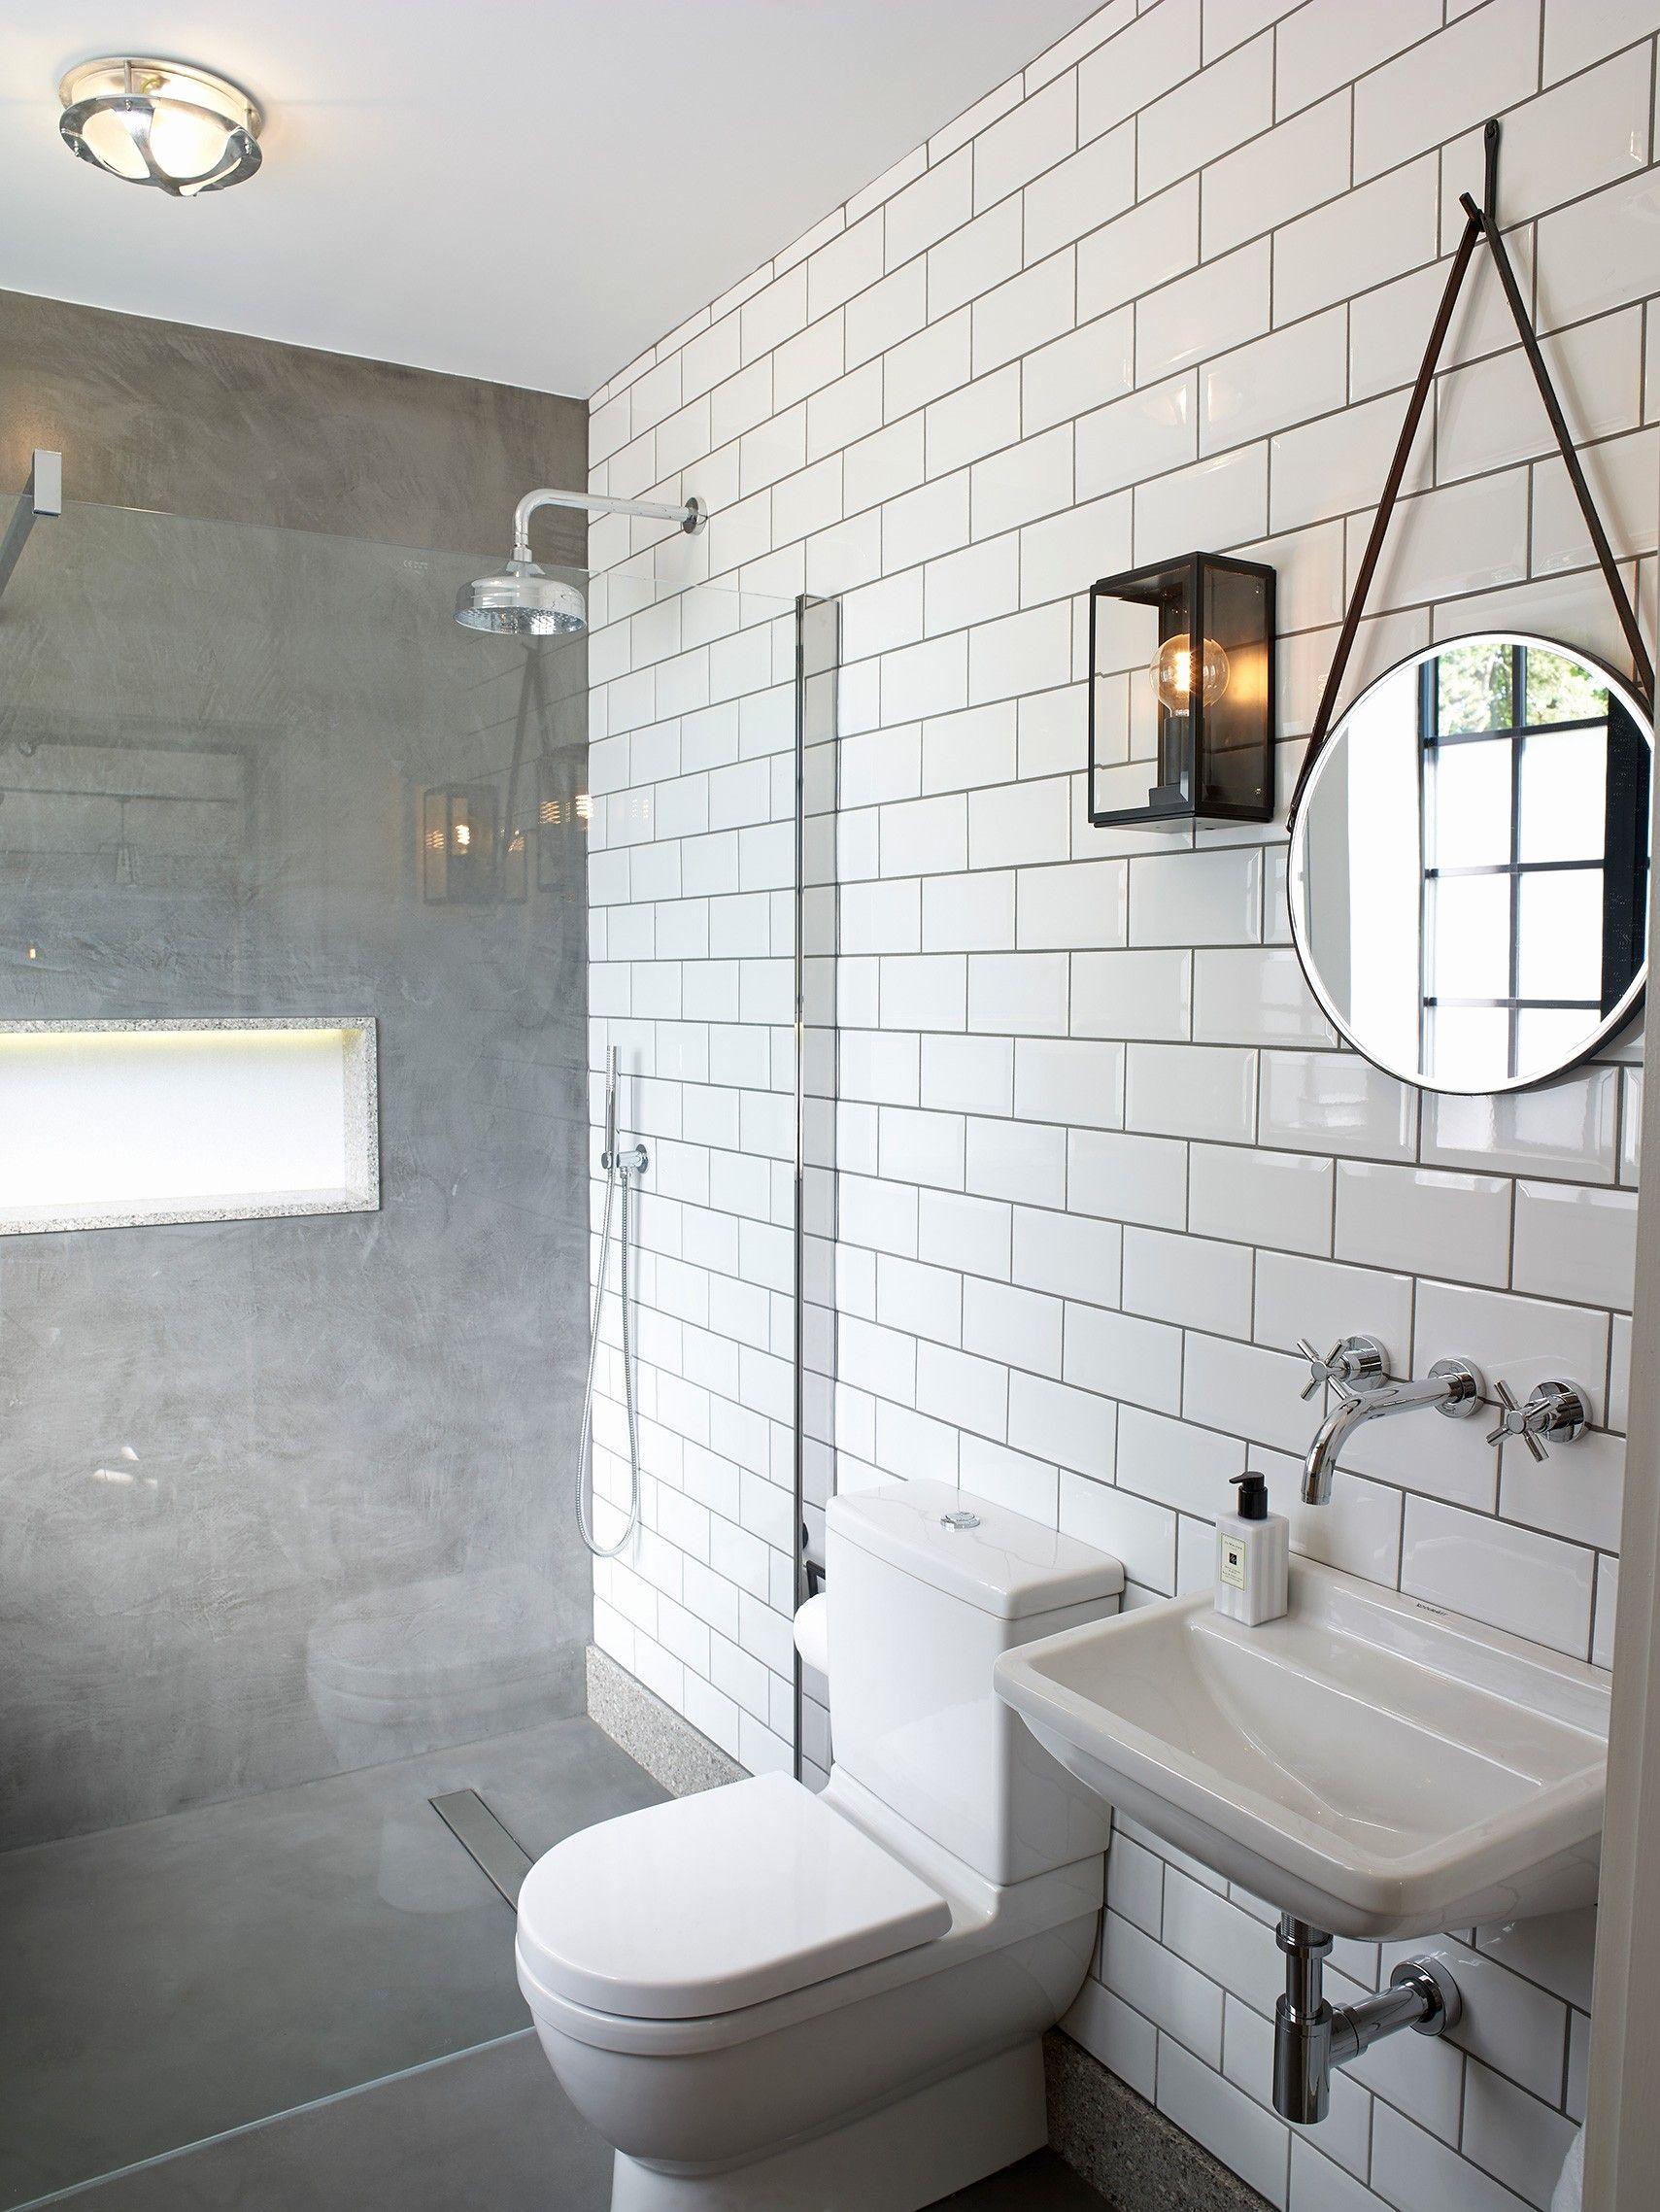 Trending Bathroom Refurbish June 2018 Tile Bathroom Small Bathroom Bathroom Layout